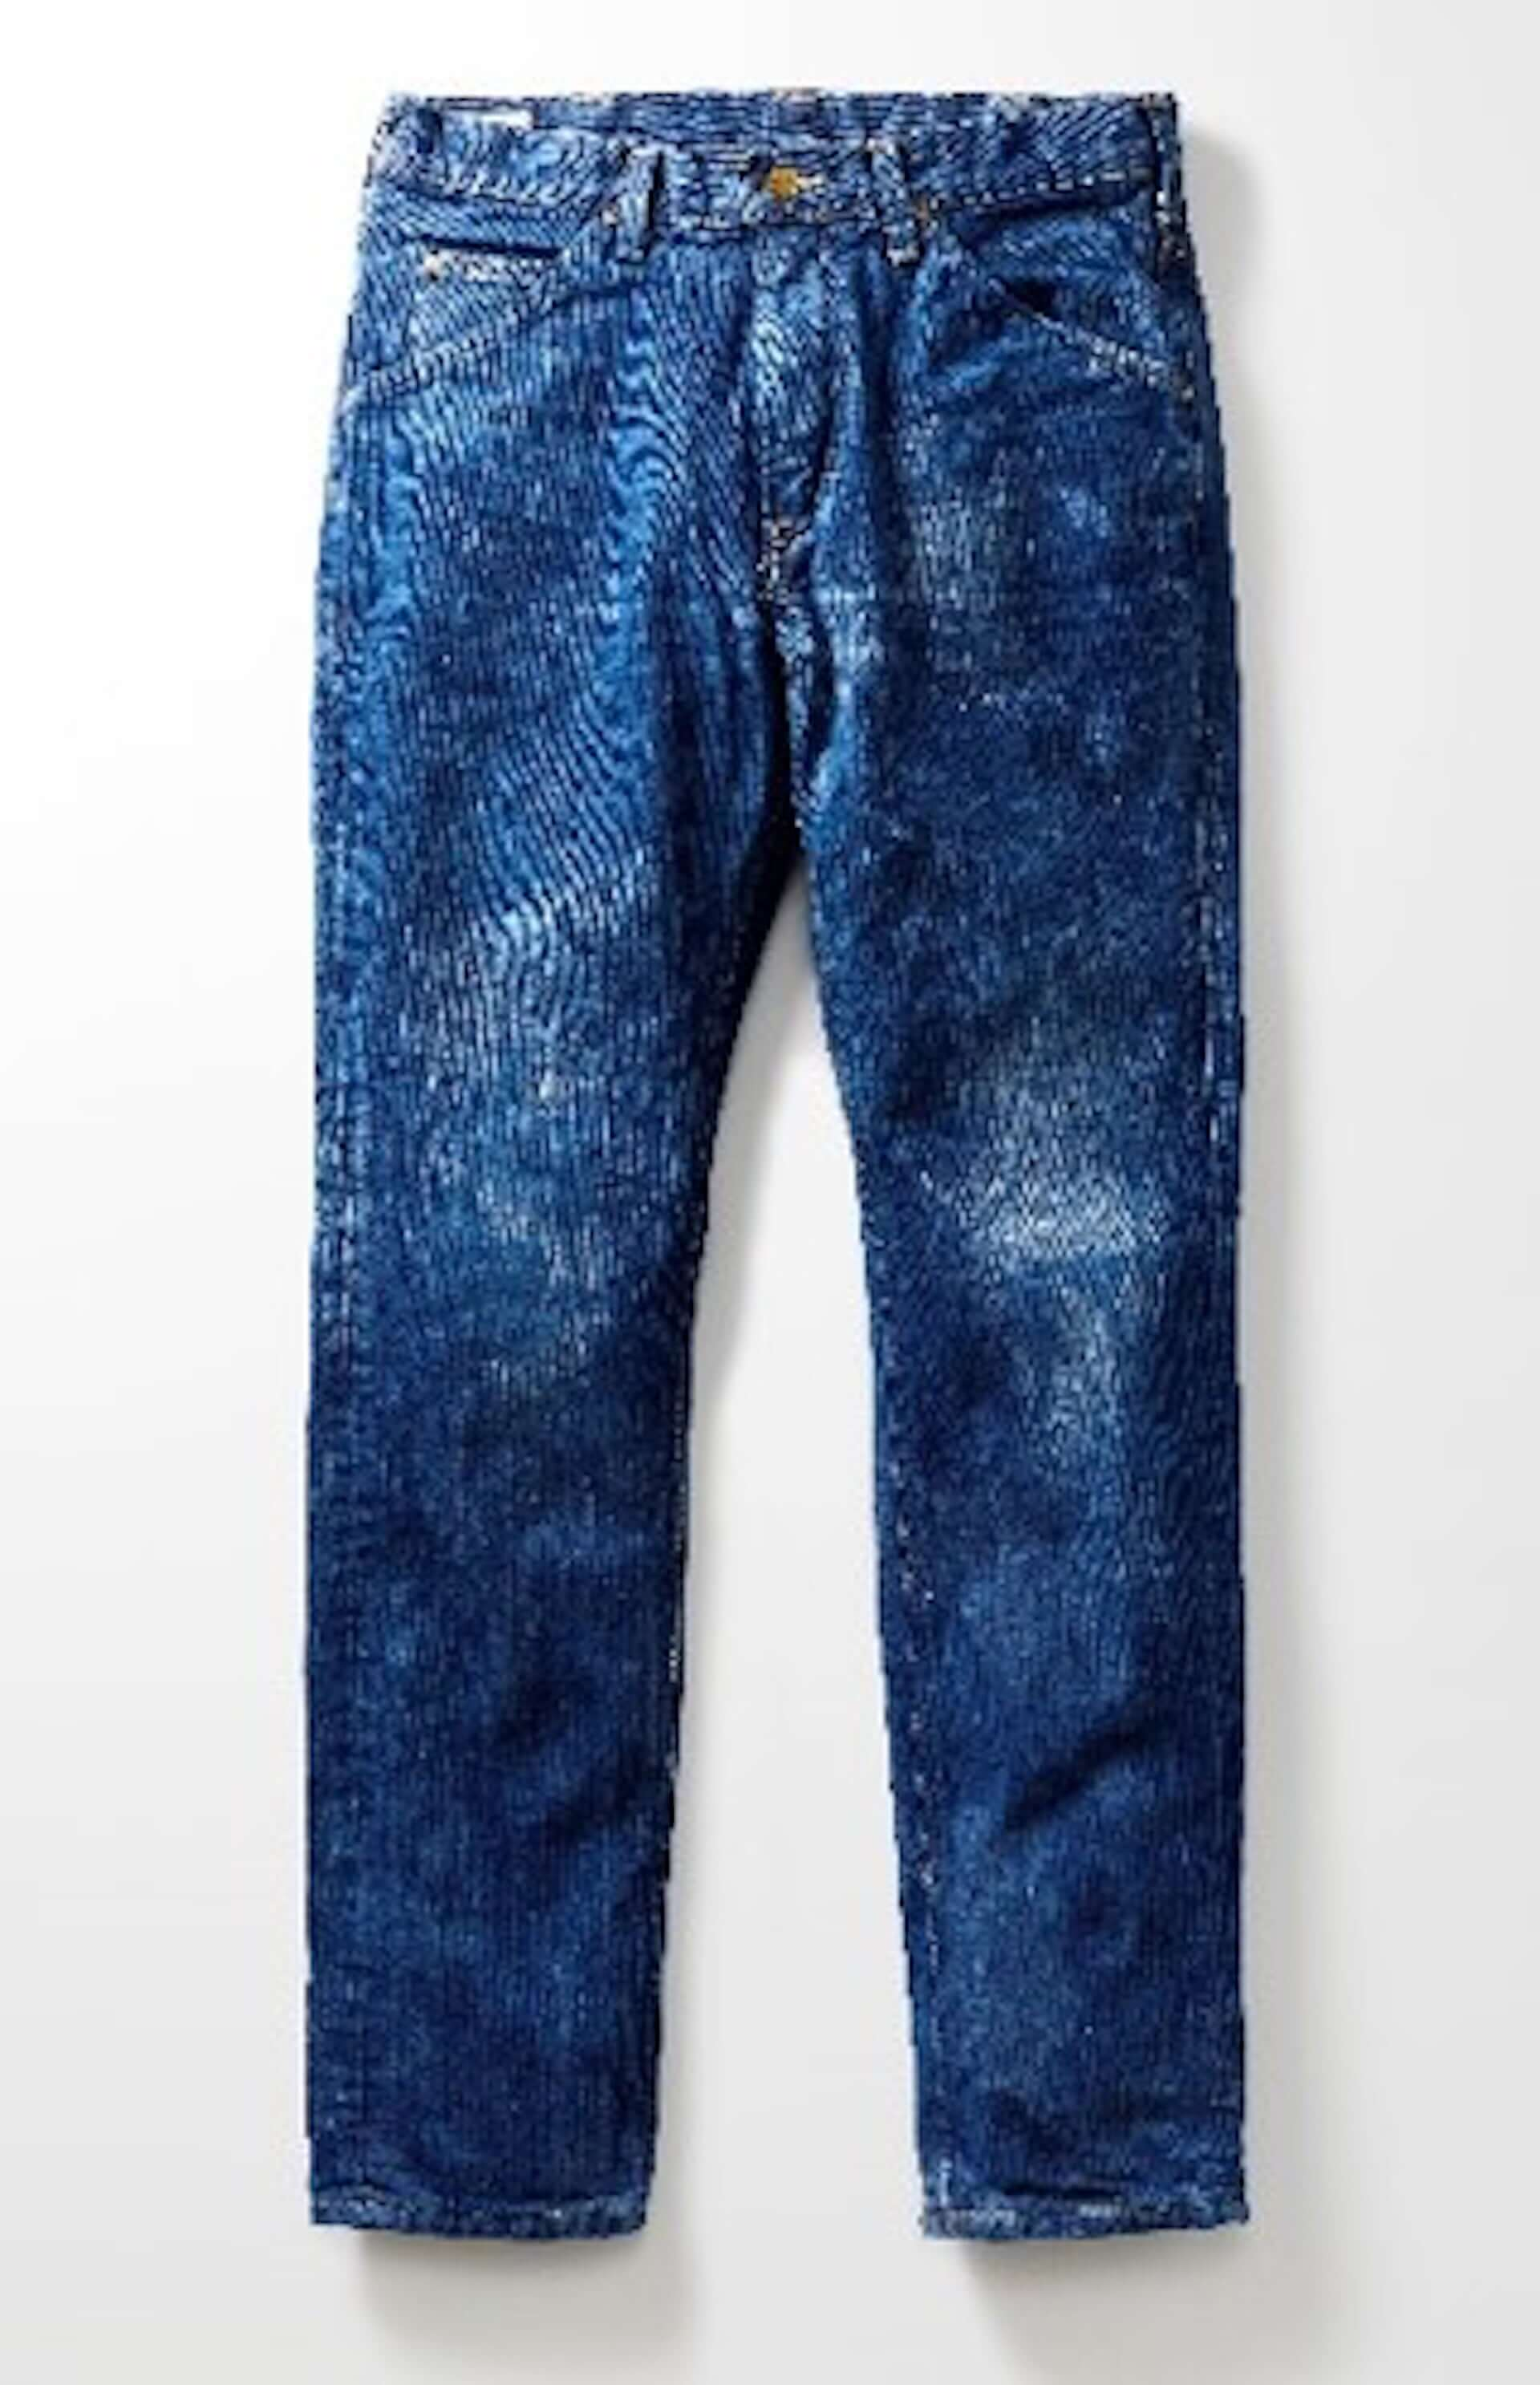 Lee原宿店で今夏注目の天然インディゴ染めTシャツやジャケットが移転1周年記念限定発売! lf200529_lee_indigo_5-1920x2973